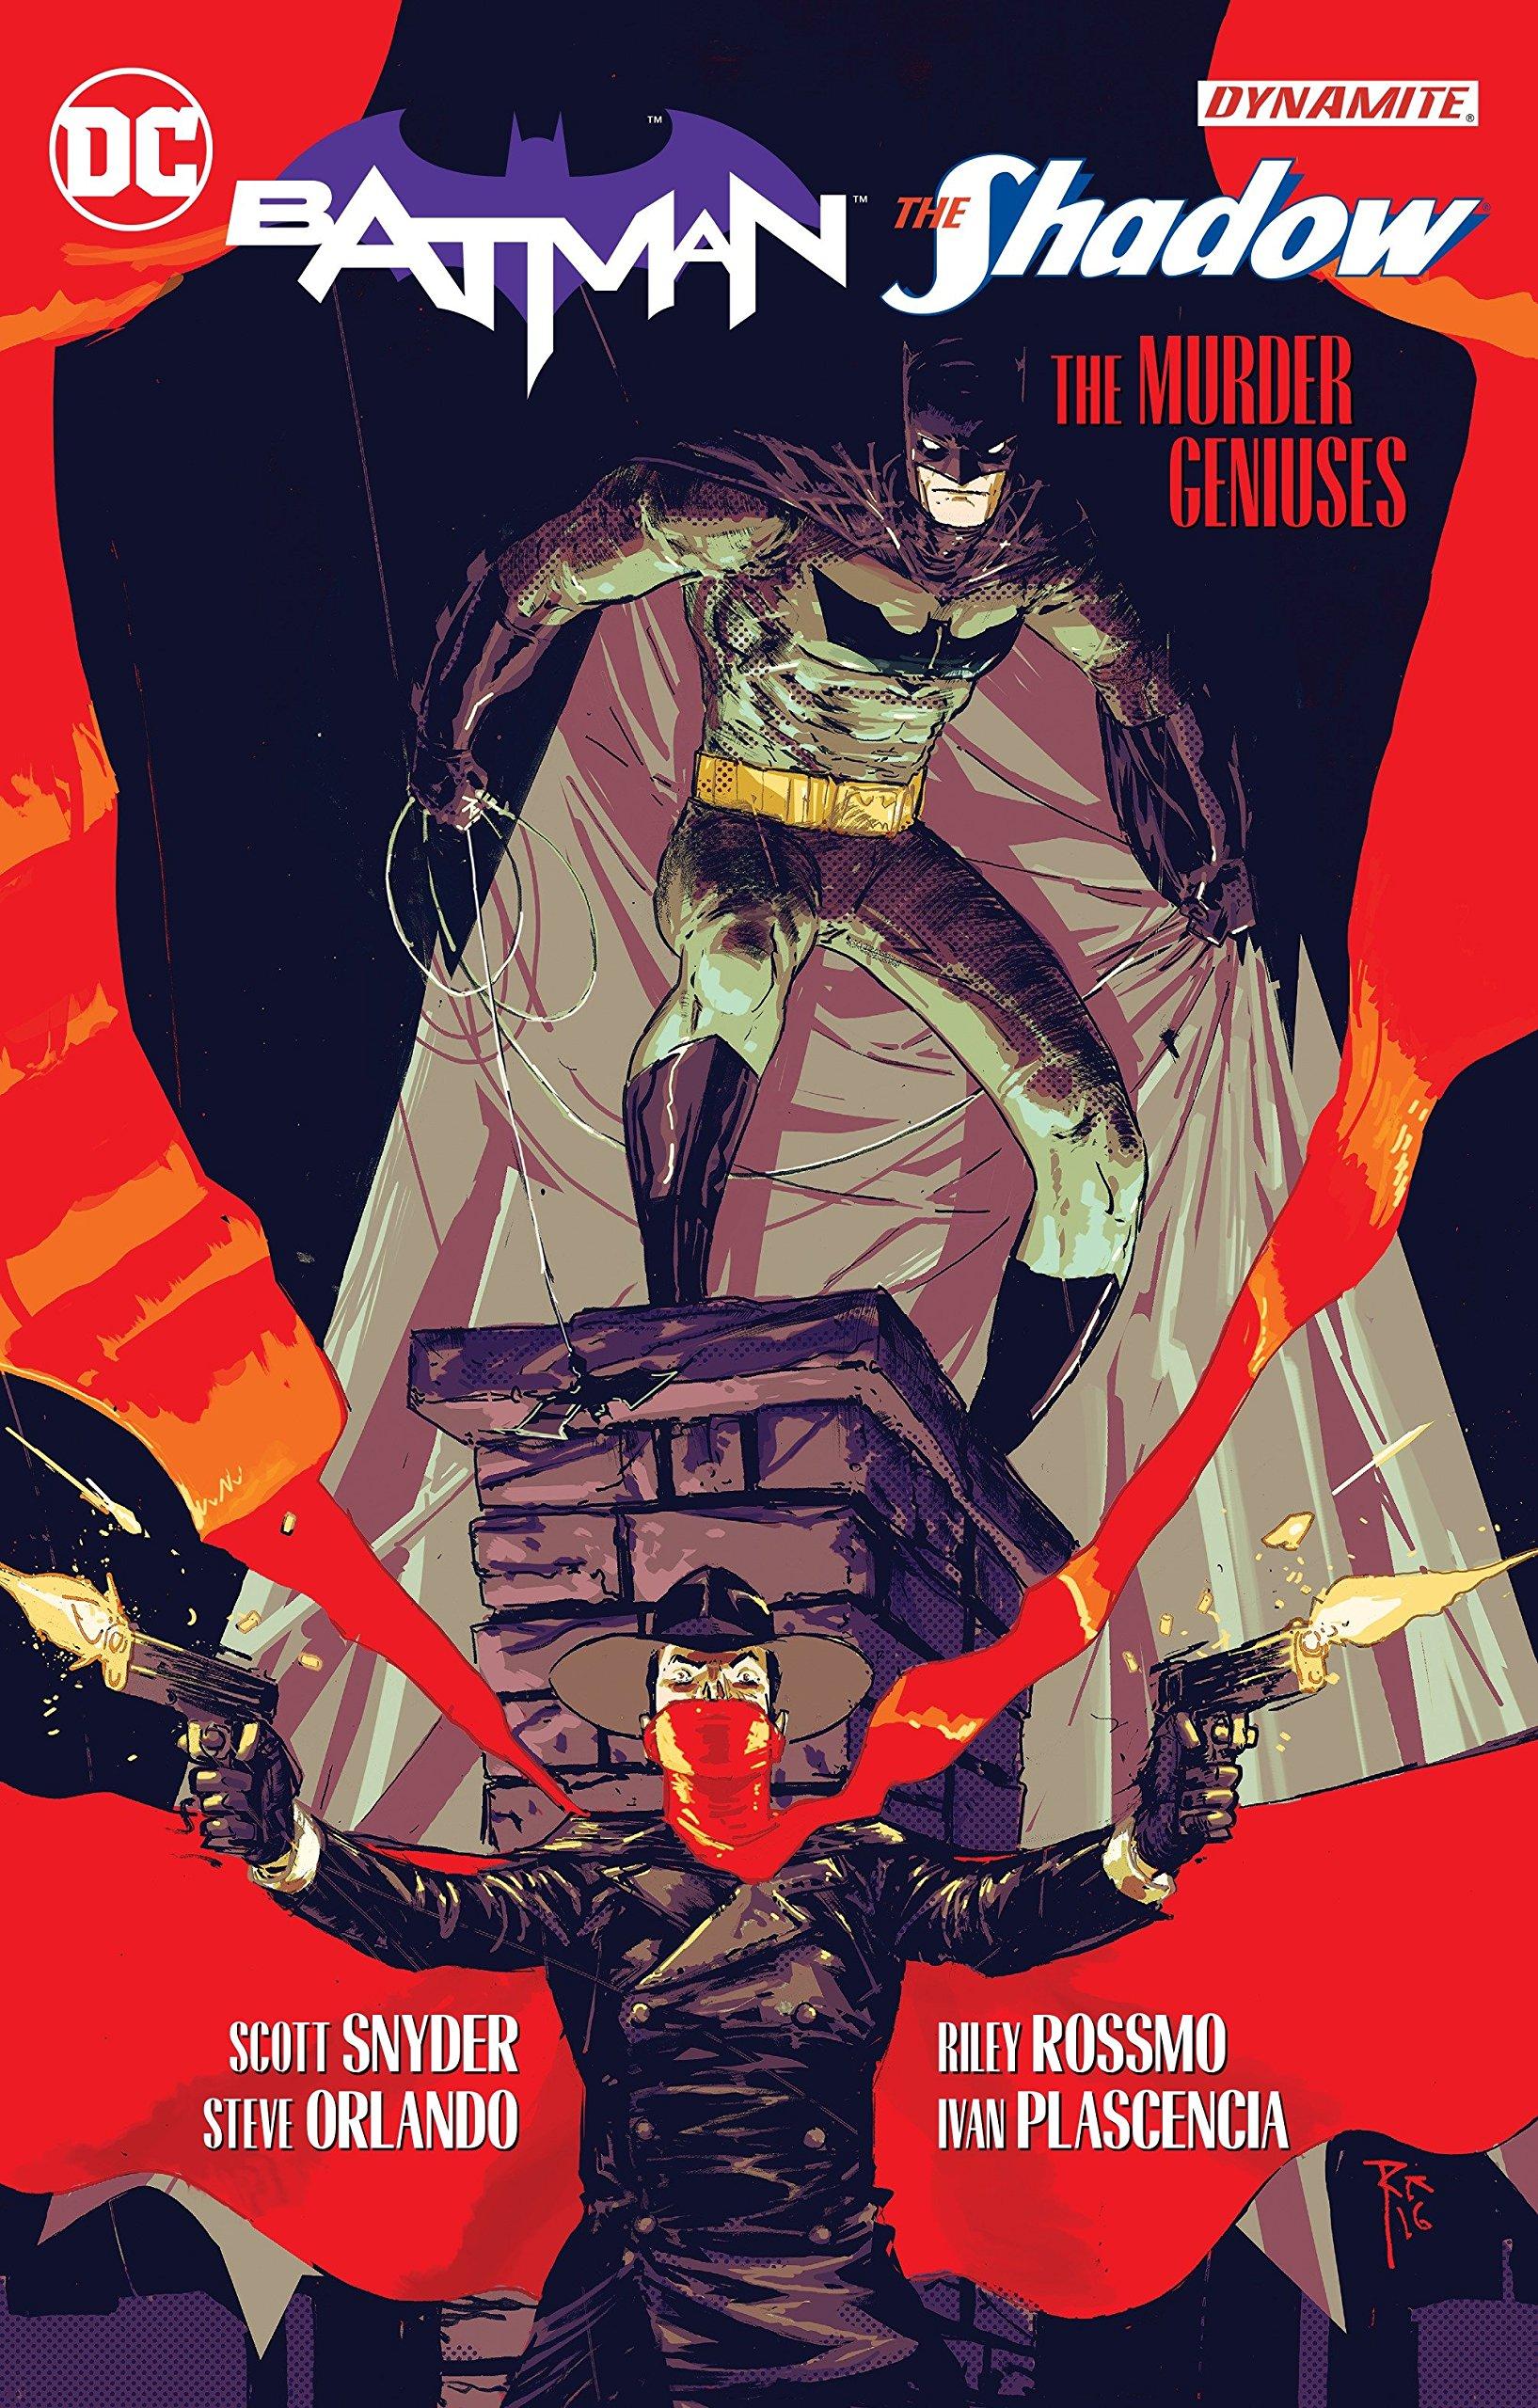 Read Online Batman/The Shadow: The Murder Geniuses ebook